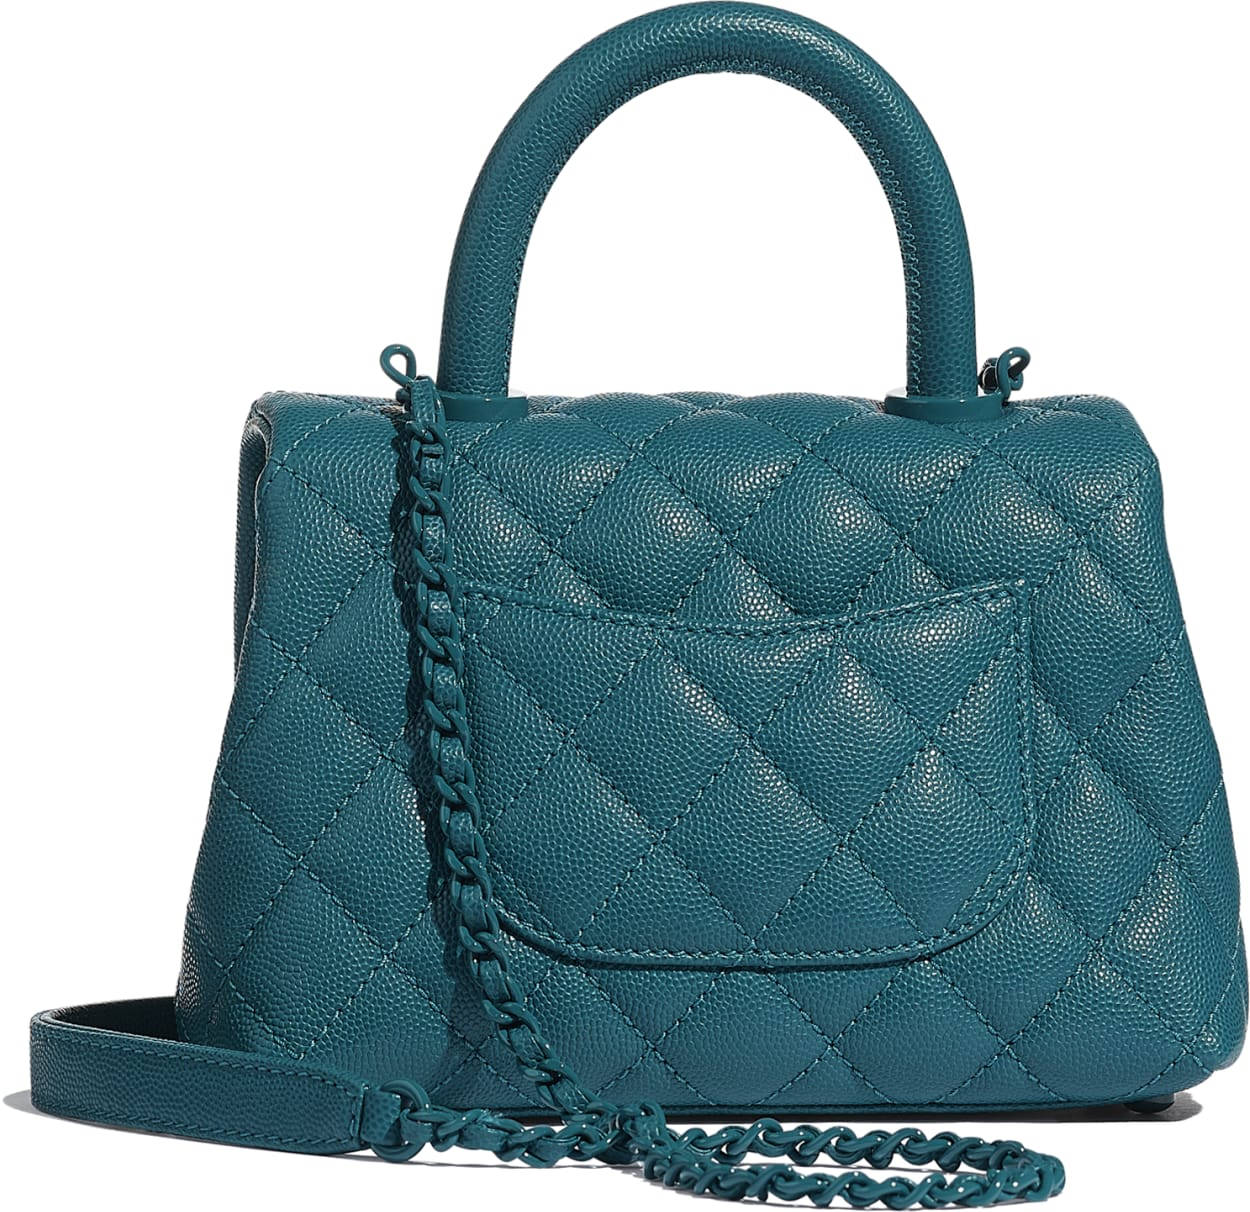 Mini Flap Bag with Handle